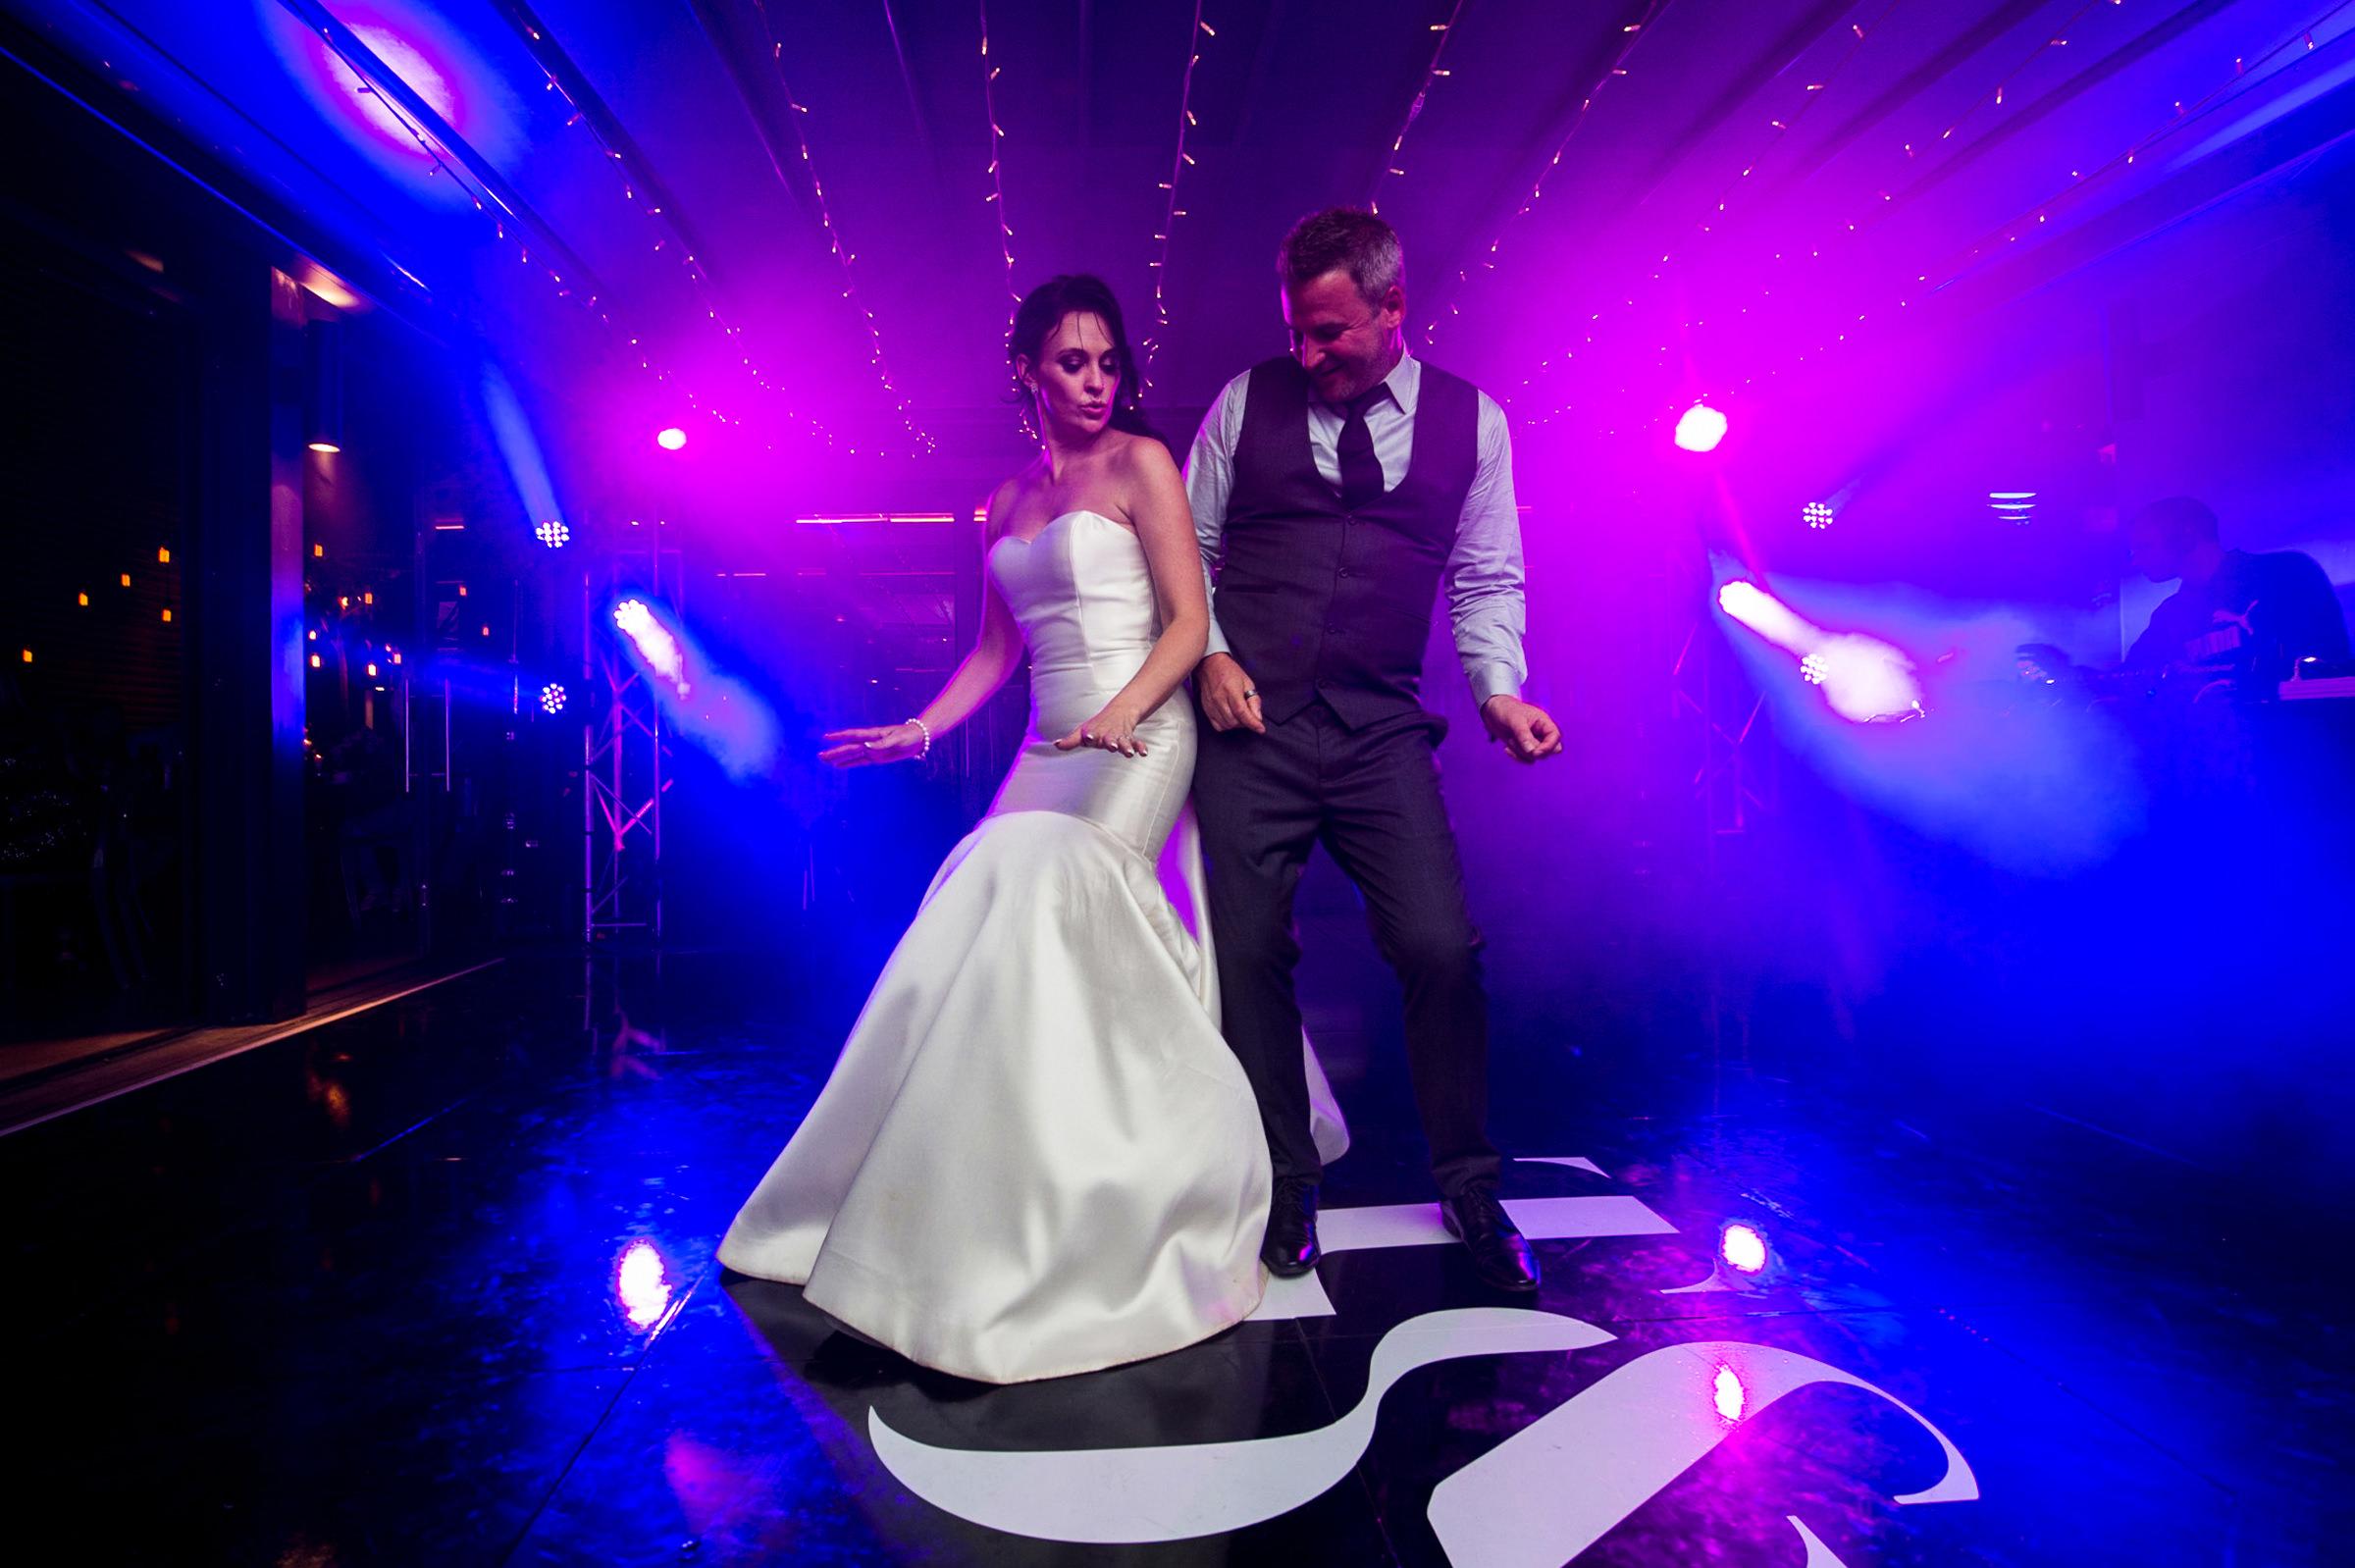 Bride and groom bump on dance floor - photo by Jacki Bruniquel